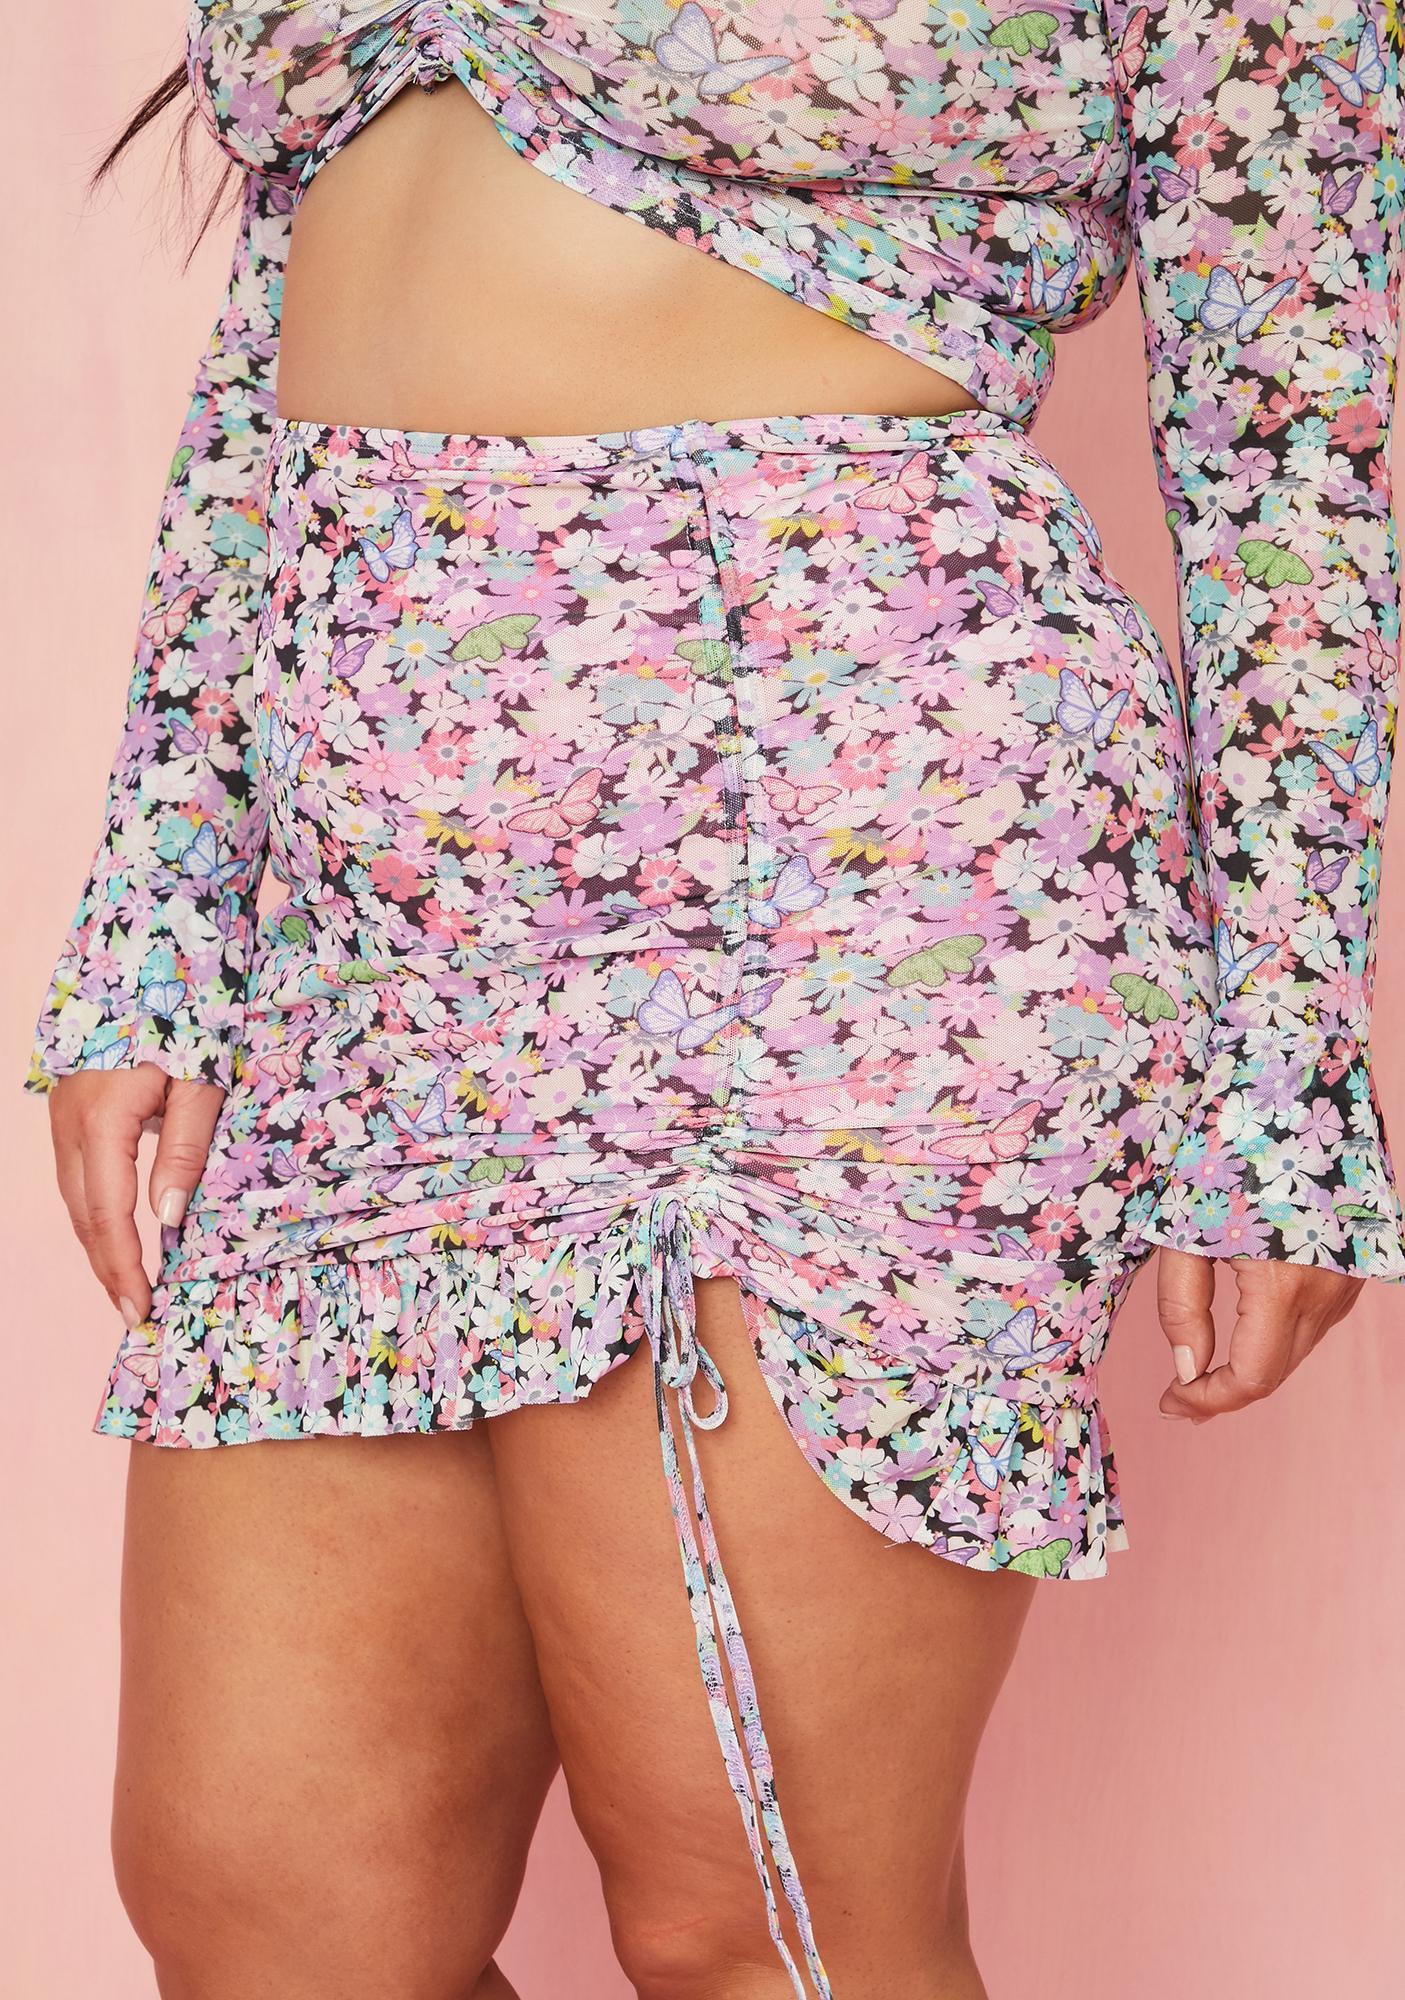 Sugar Thrillz Got Spring Fever Ruched Mini Skirt